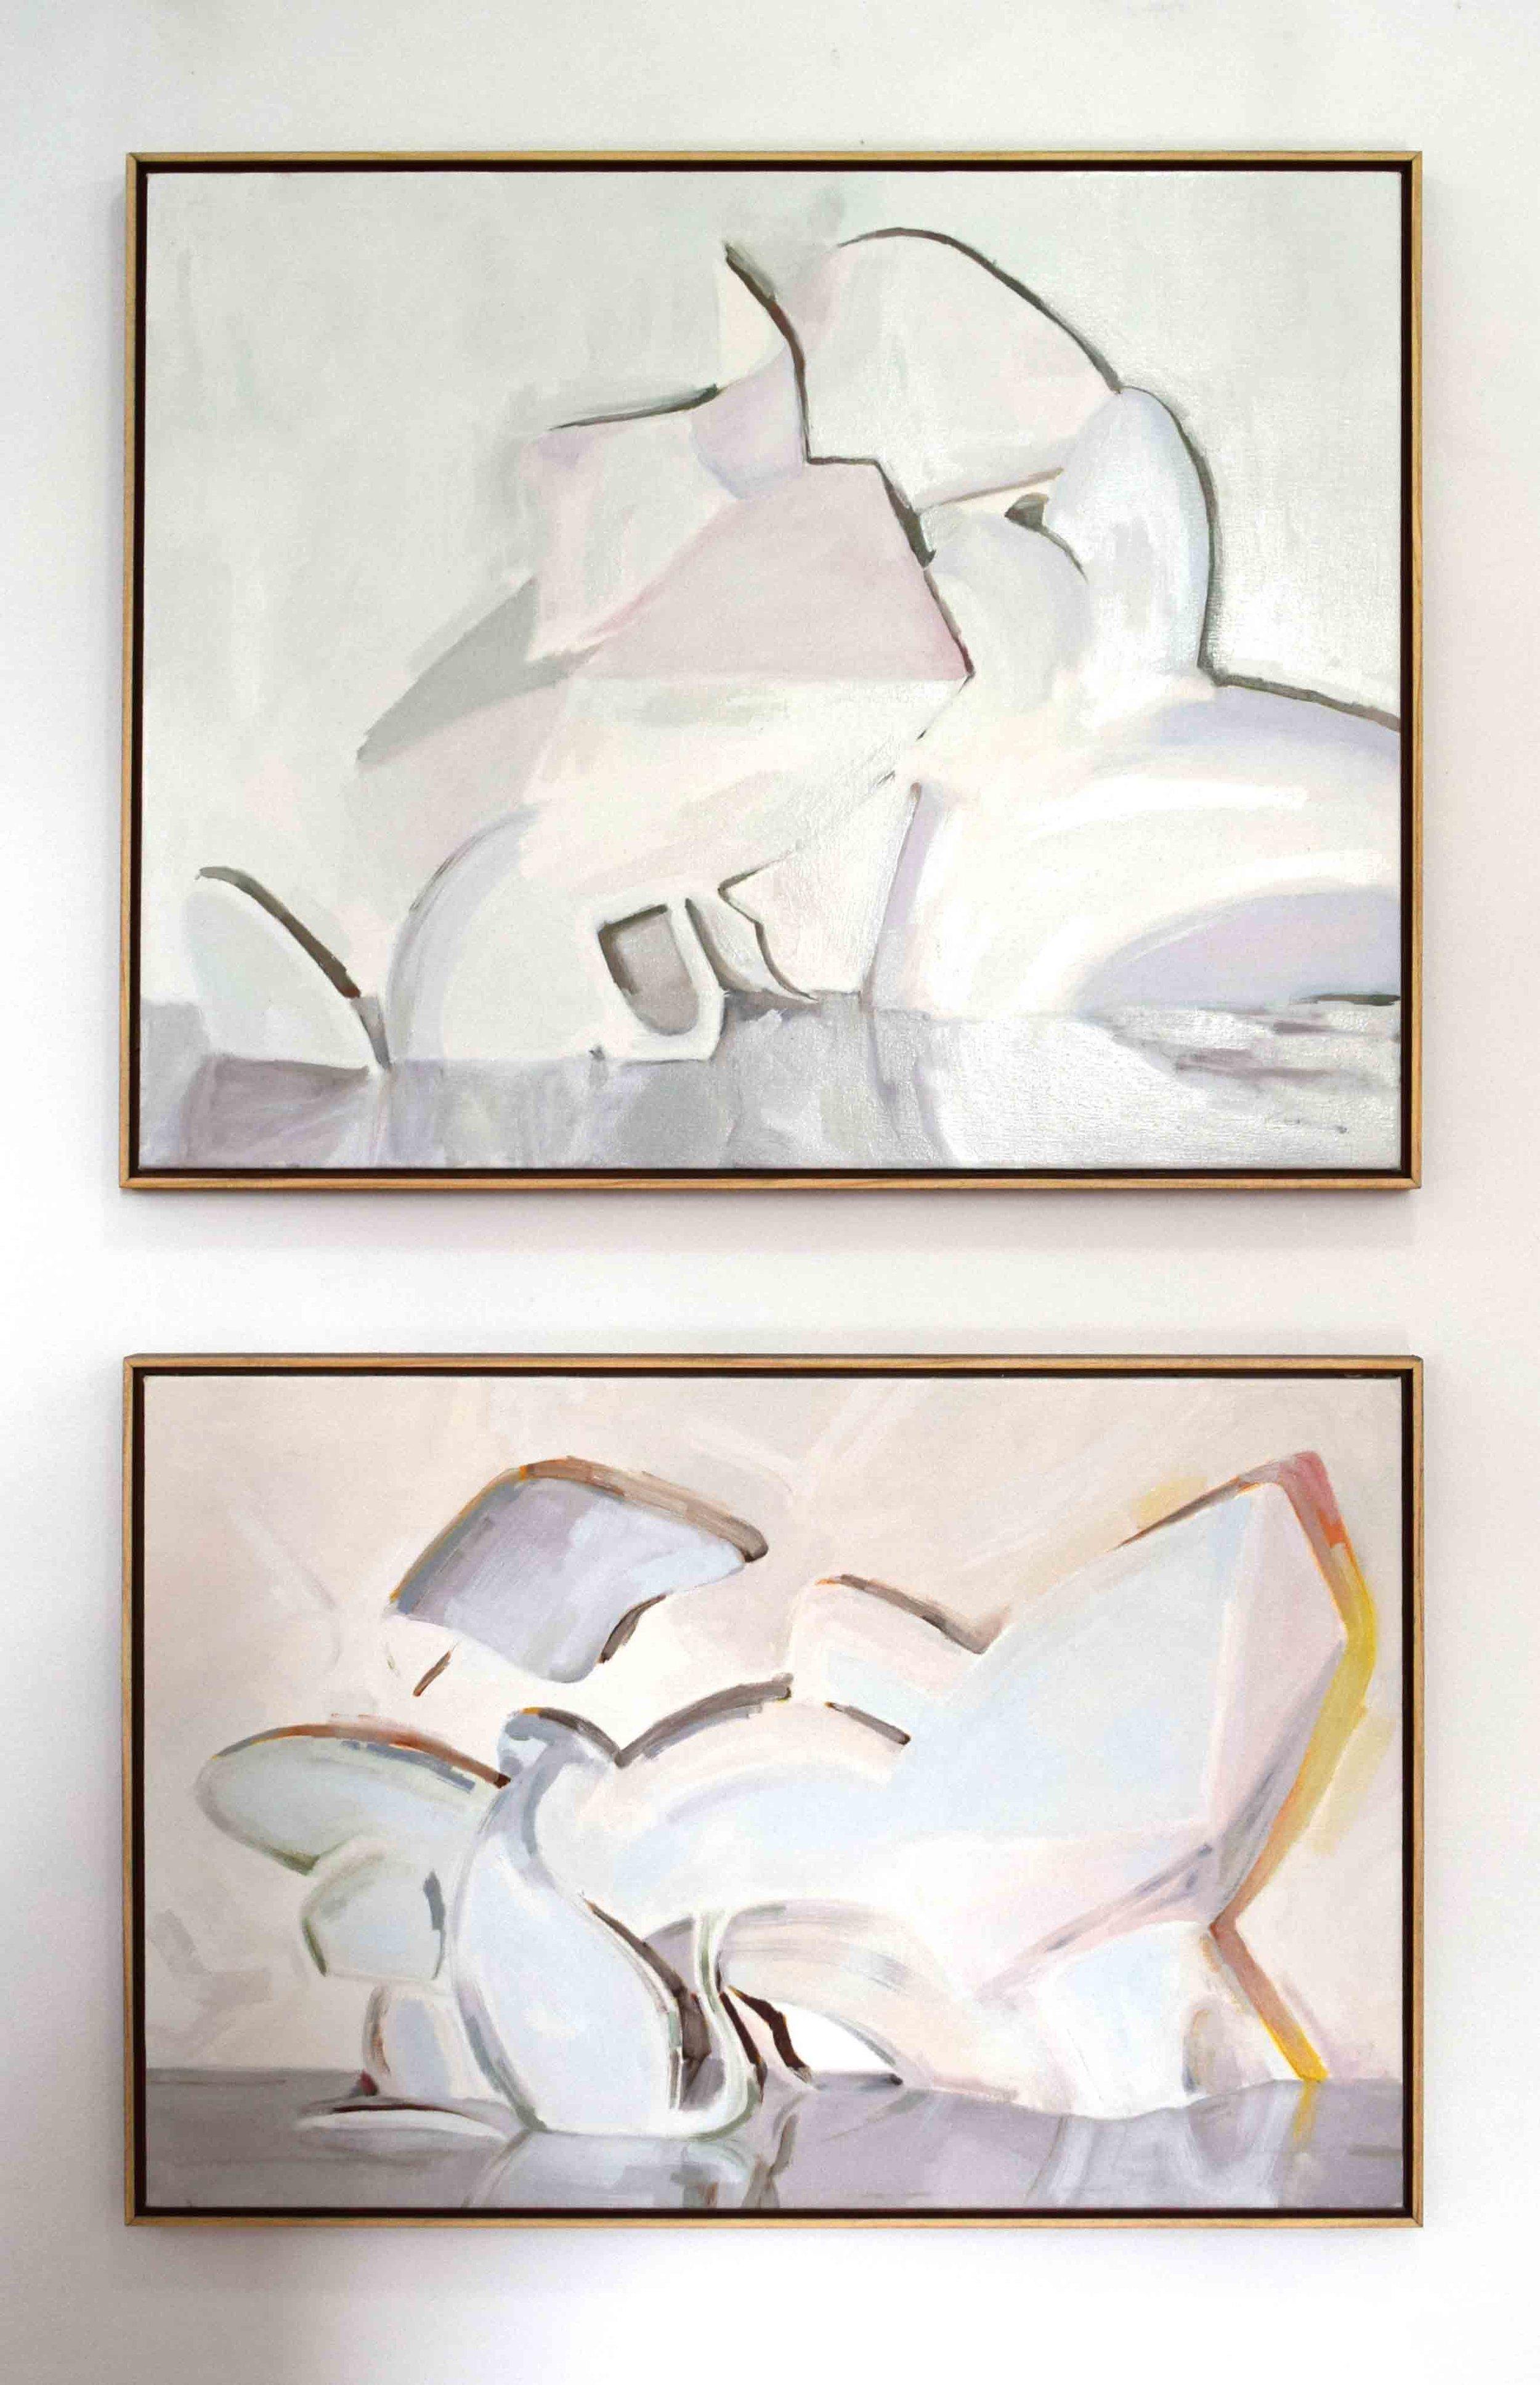 11. Ian Williams,  True Companions,  2018, oil on canvas, 61 x 76 cm $1,290  12. Ian Williams,  Illumine , 2018, oil on canvas, 50 x 76 cm $1,250